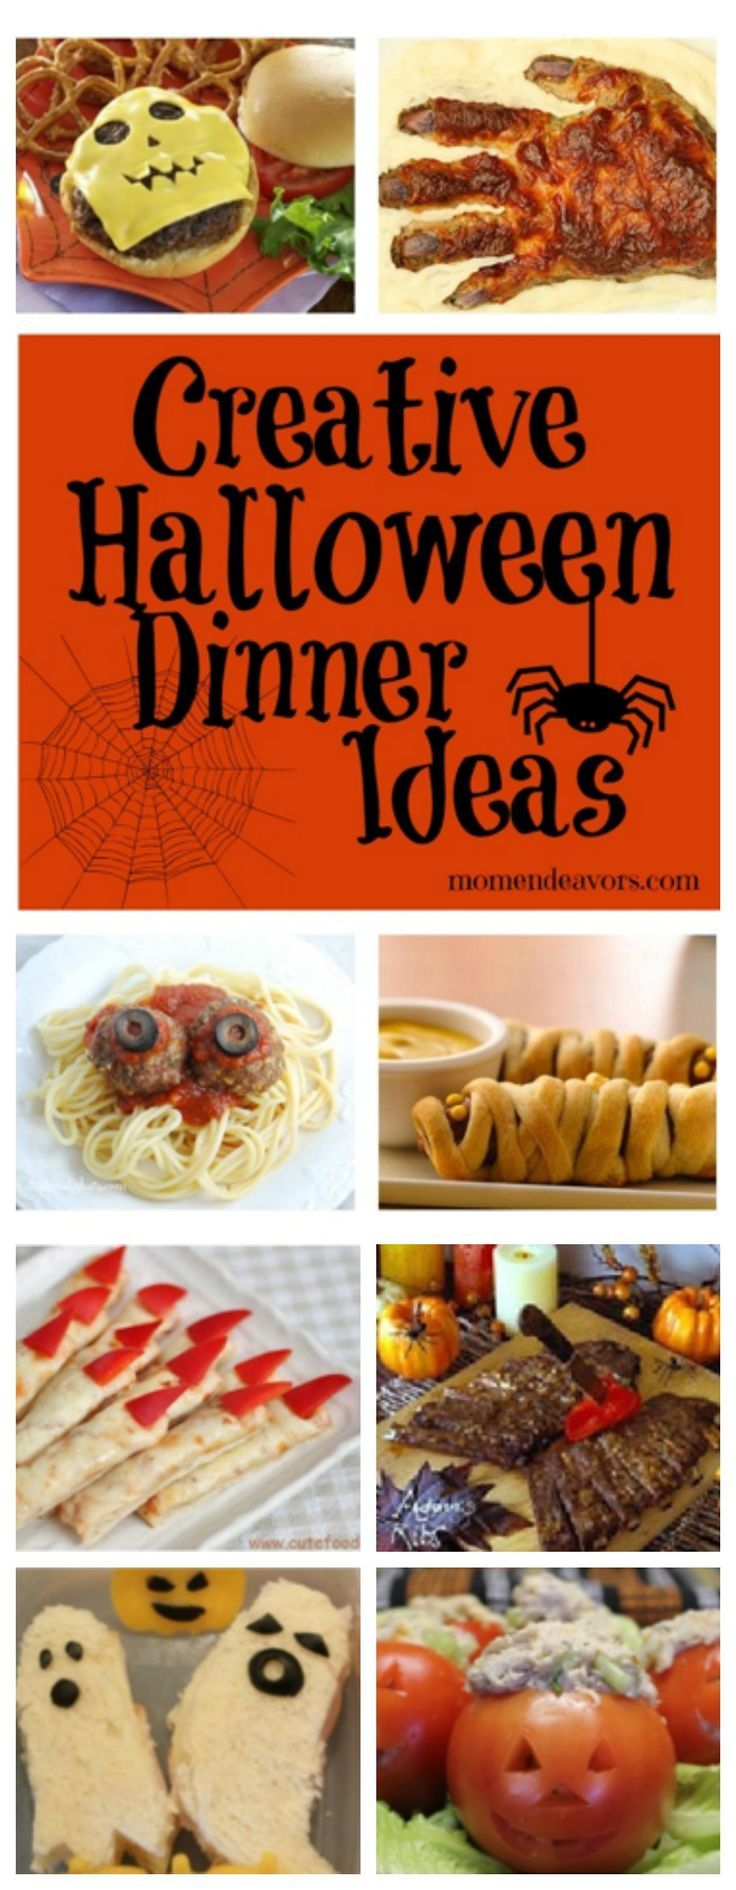 25+ spooktacular Halloween dinner ideas & side dishes! via http://momendeavors.com